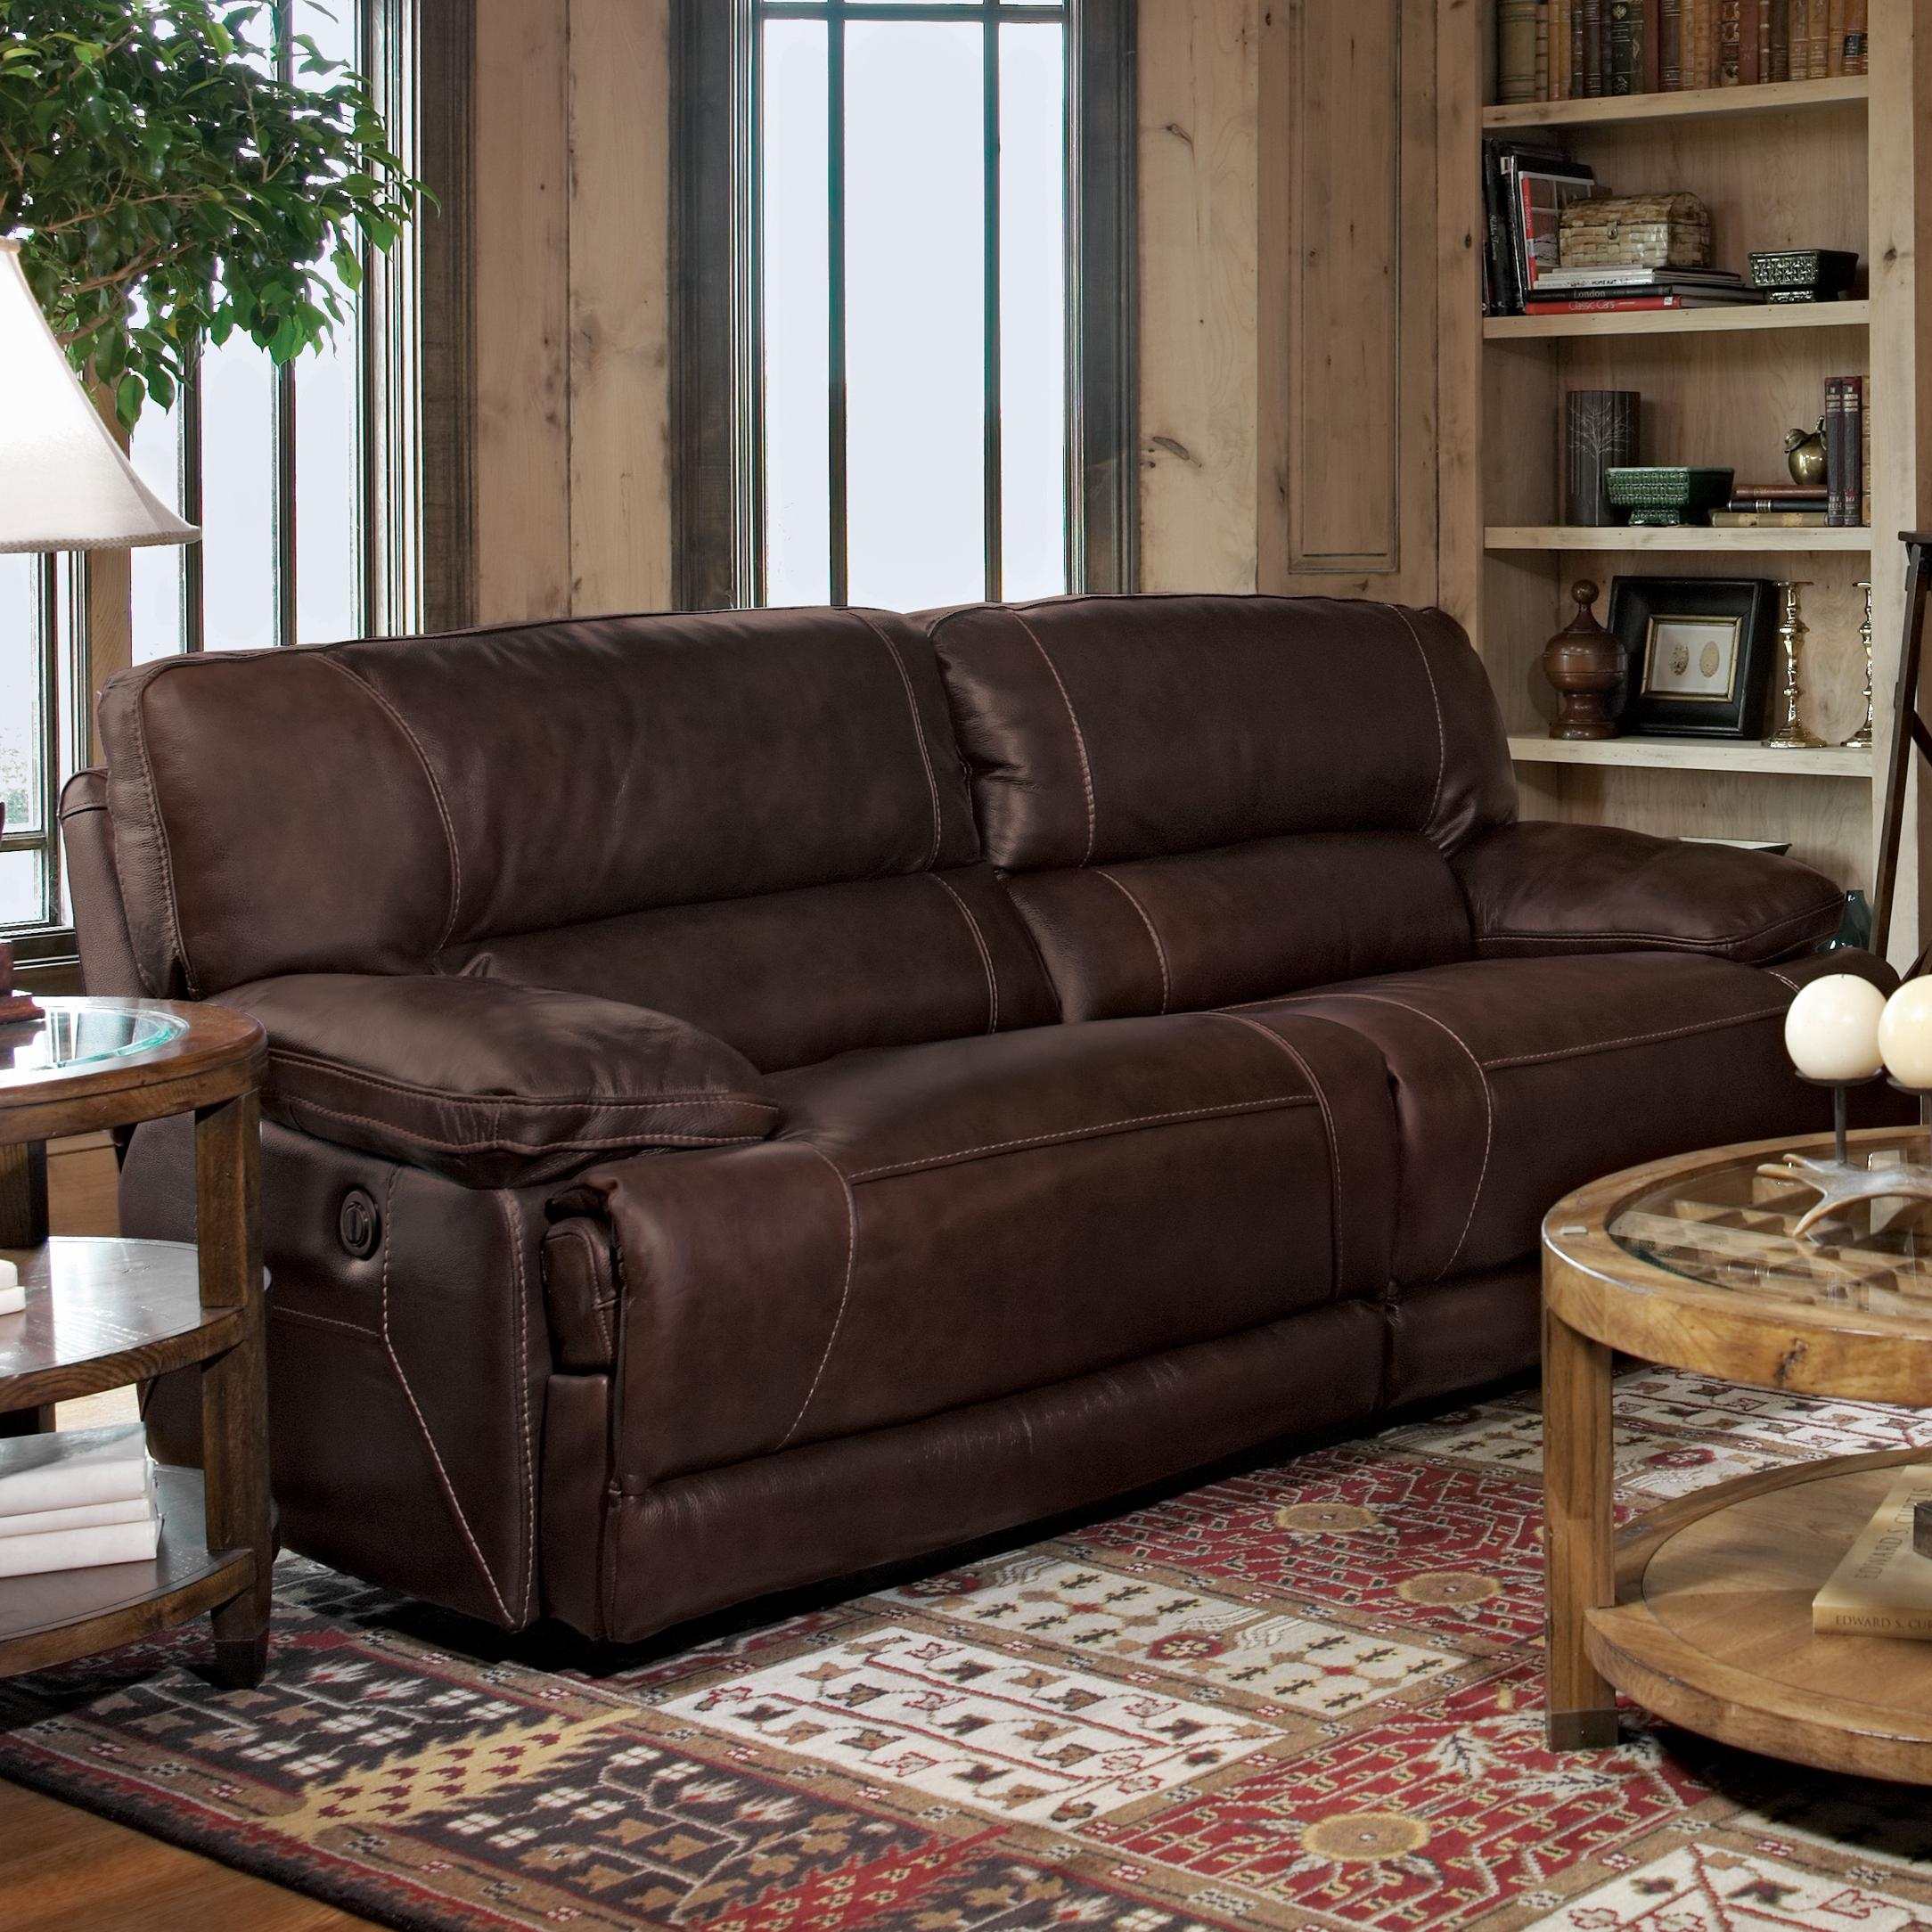 flexsteel sofa sets corner bed cheap latitudes fleet street double power reclining